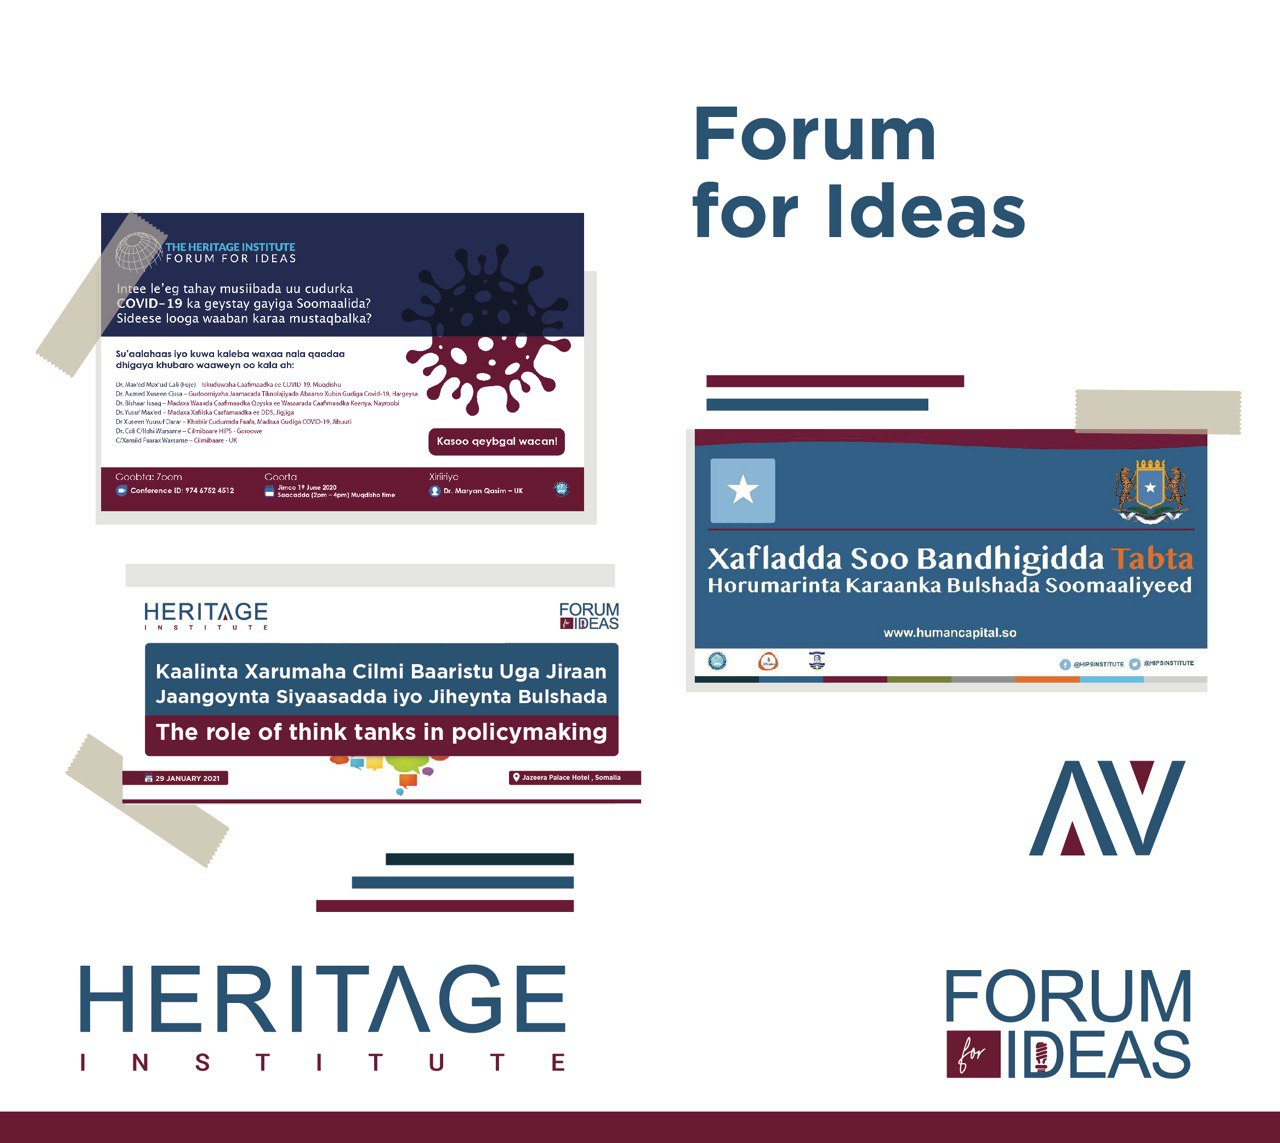 Forum for Ideas